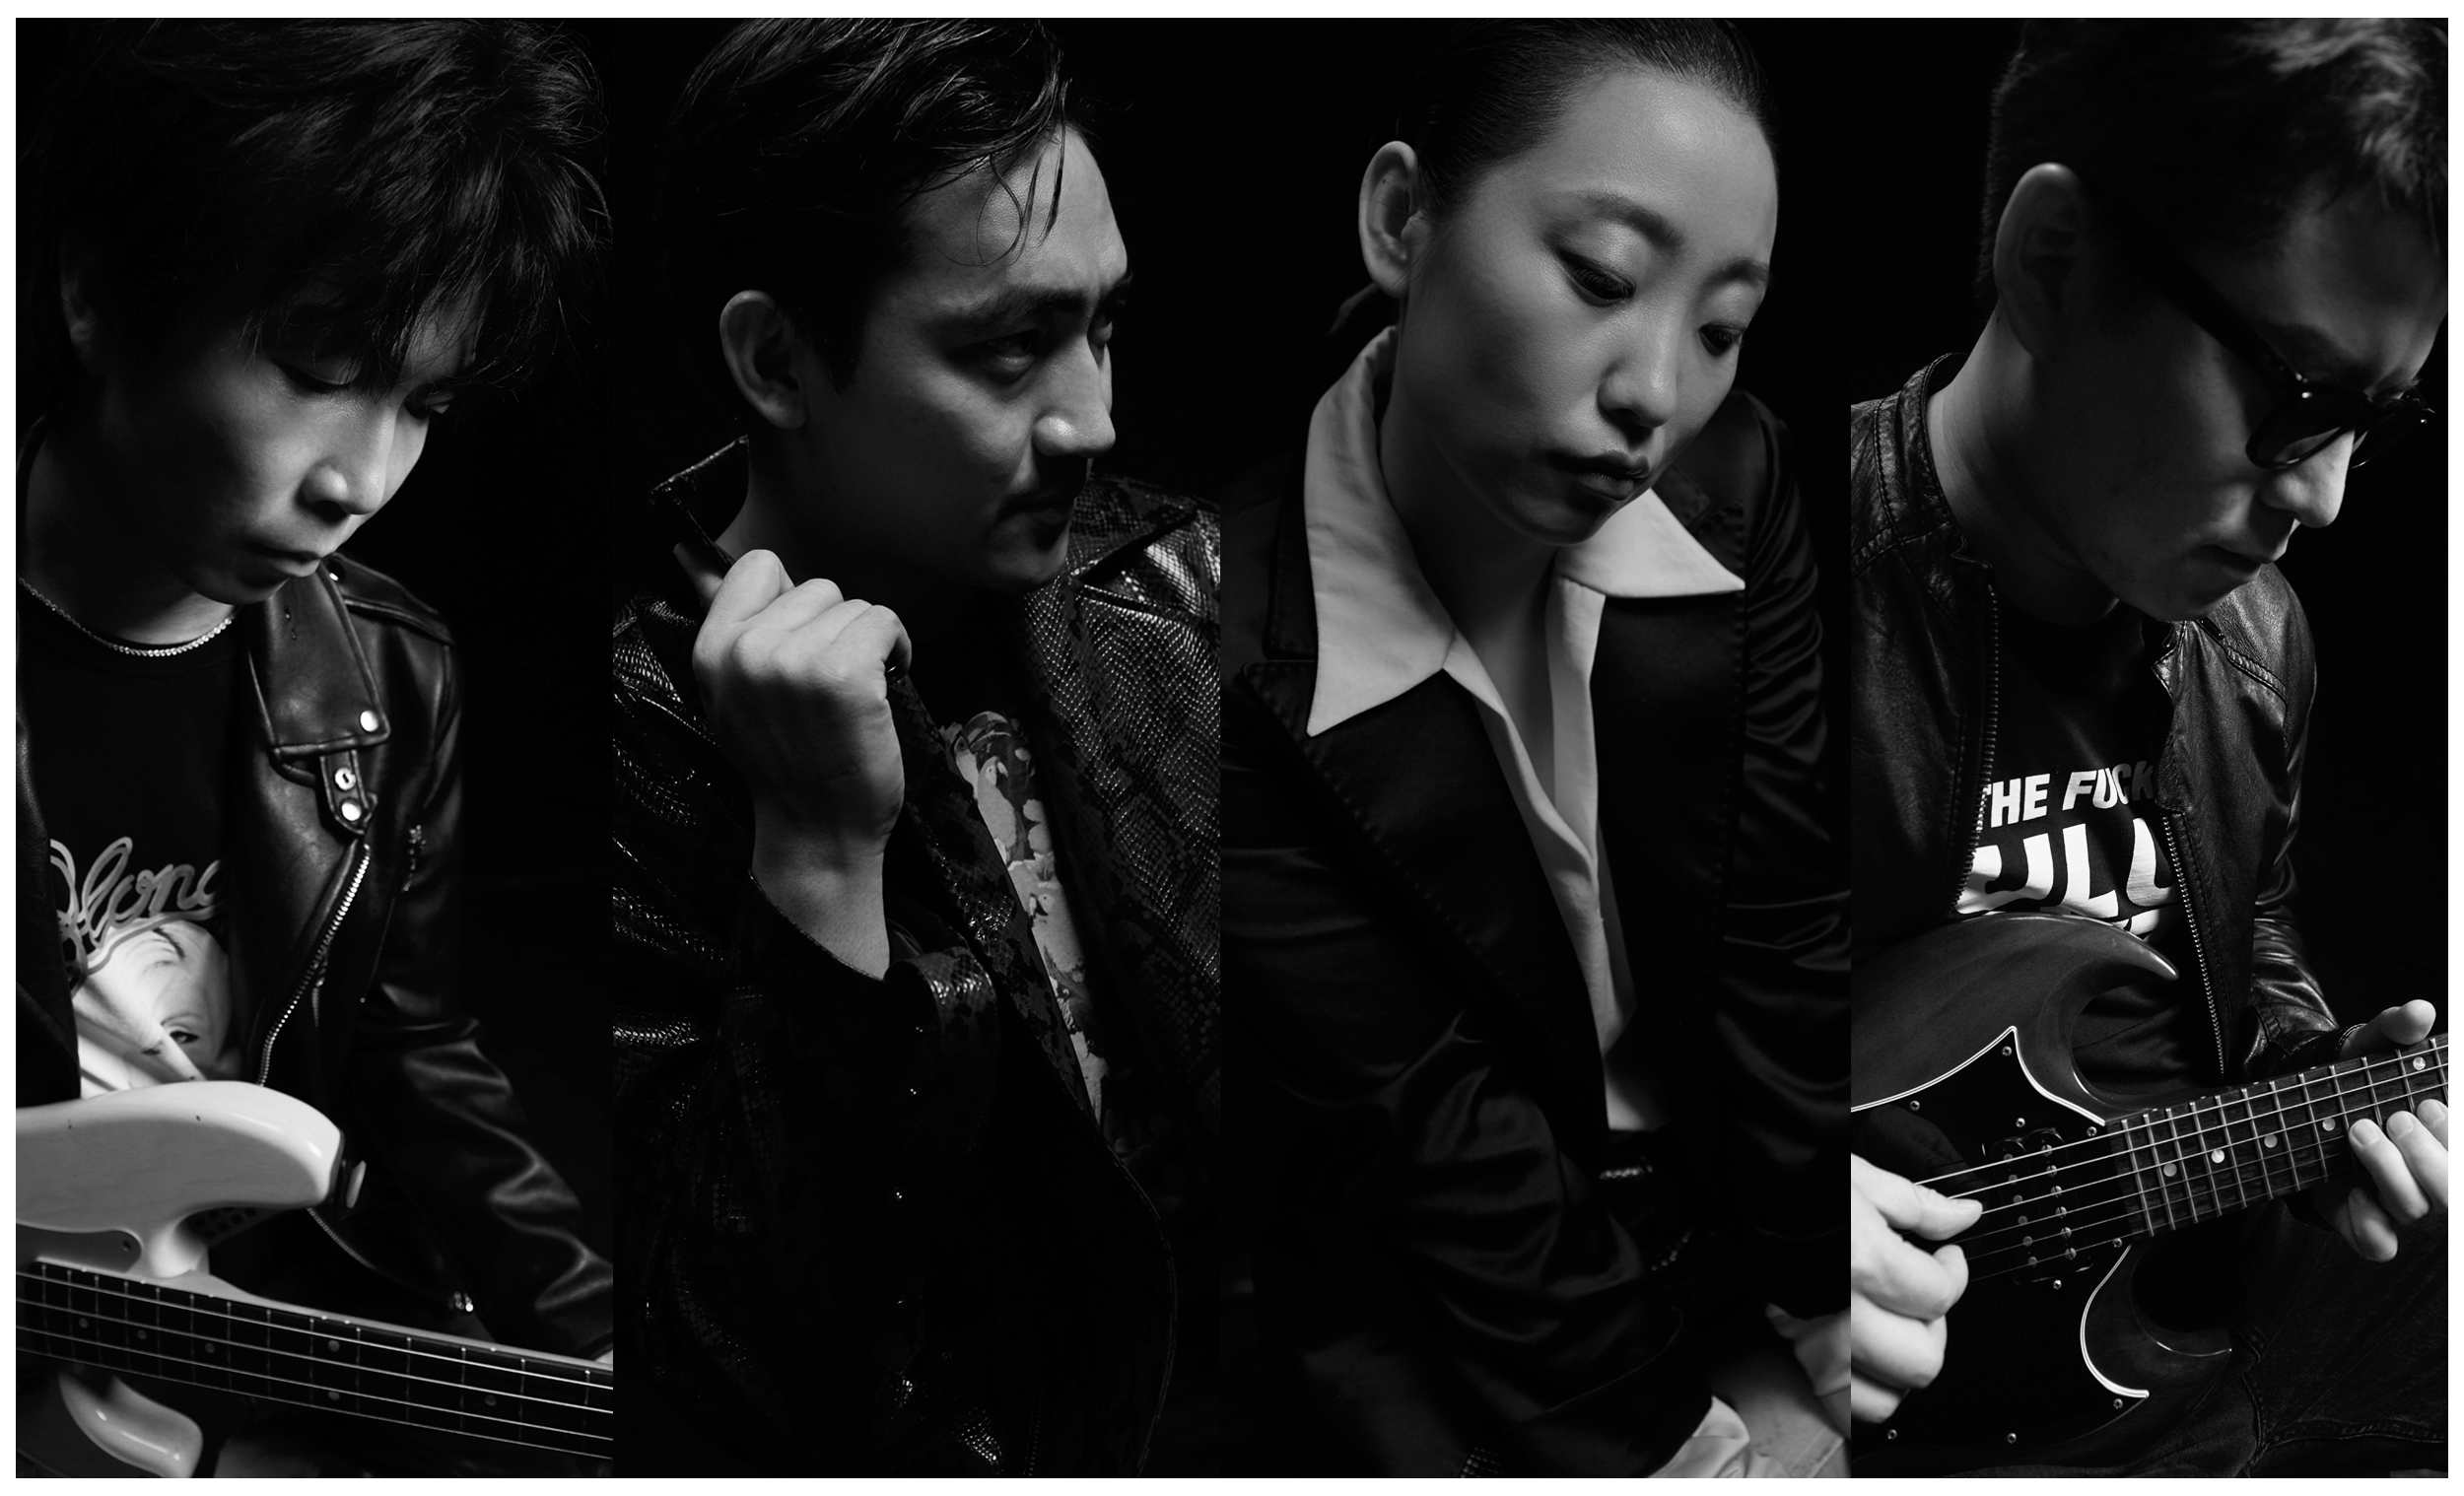 Hulu Boyz新单《来自冥王星的爱》今日上线 (1).jpeg